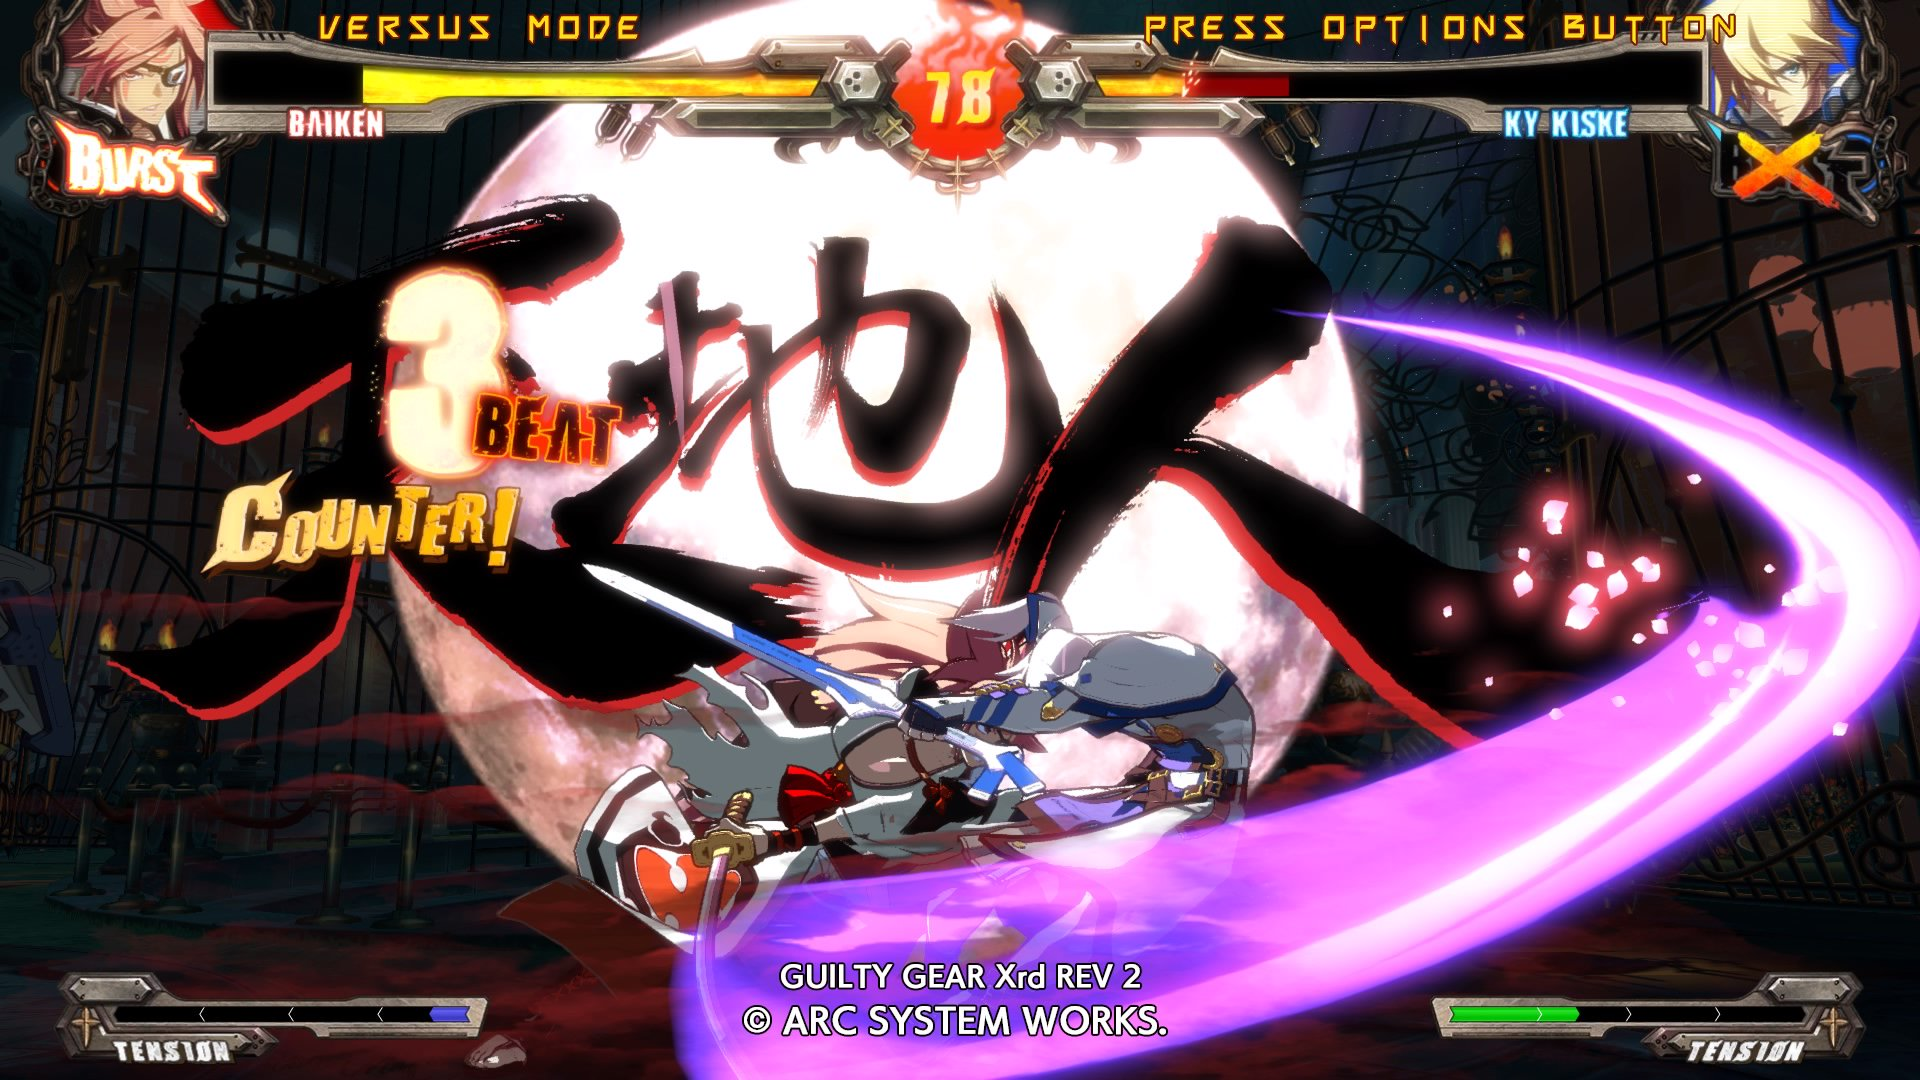 Pqube Games On Twitter Guilty Gear Xrd Rev 2 Will Be Releasing